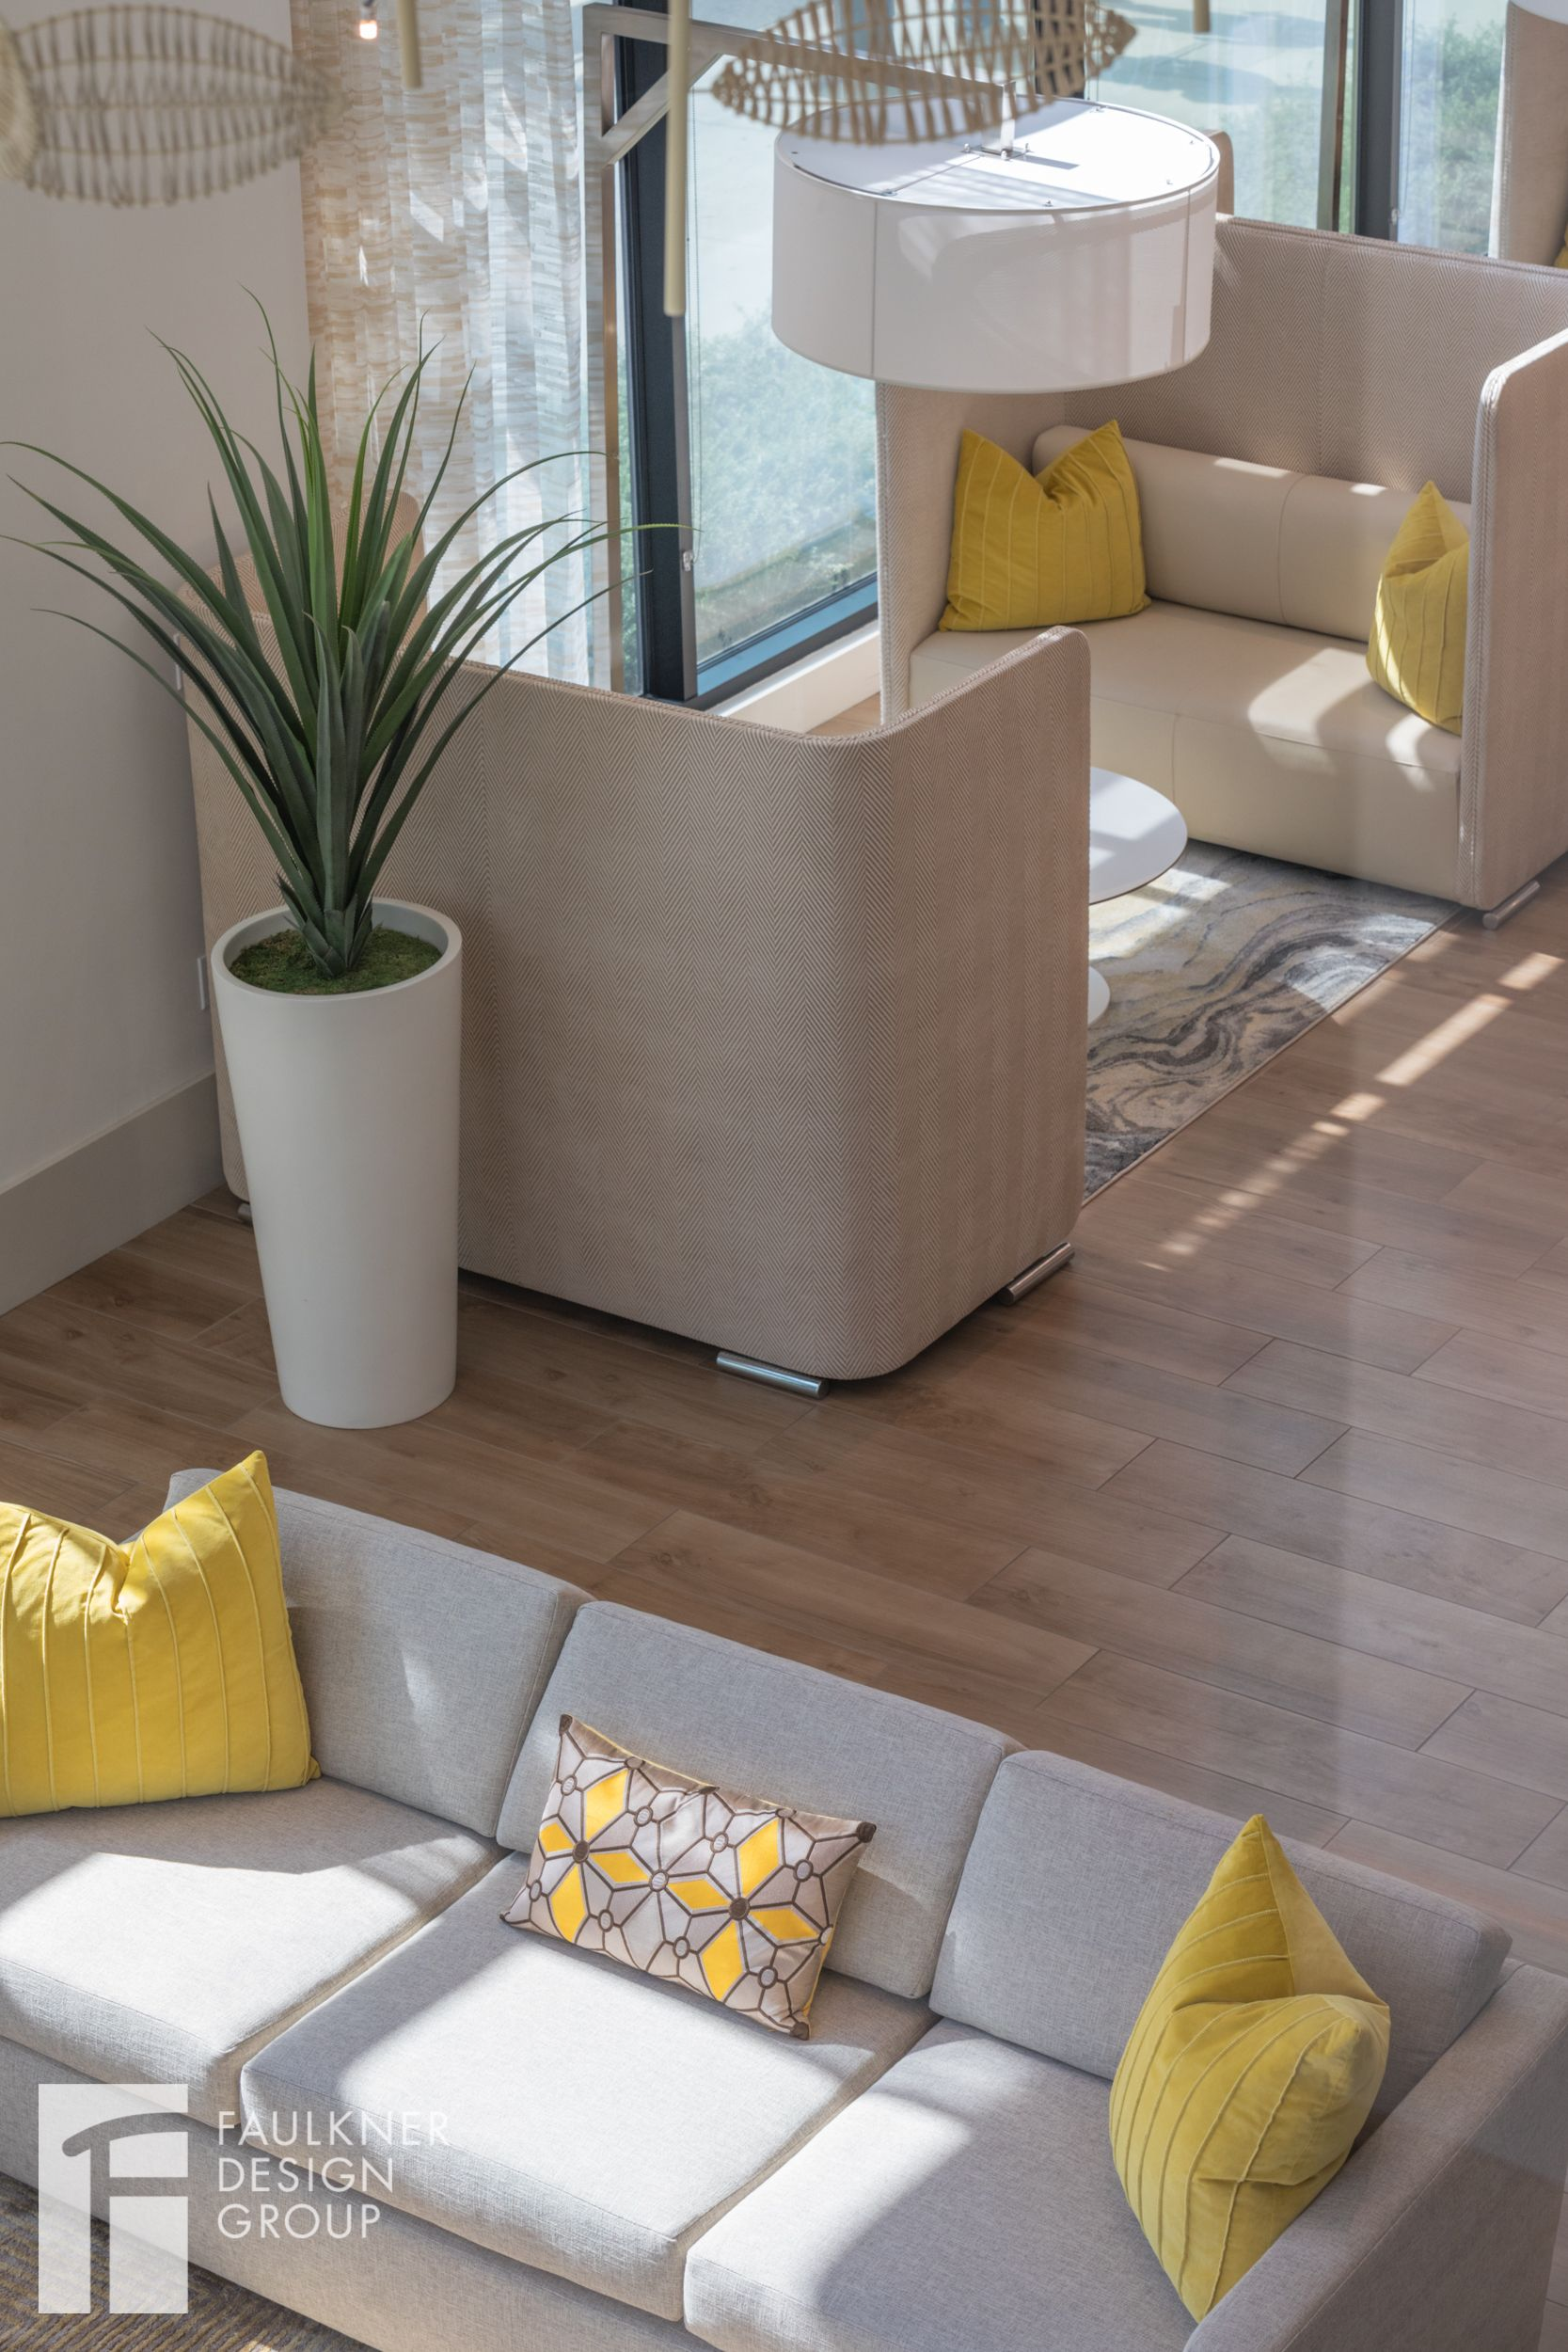 Designed By Faulkner Design Group Clubroom Lobby Lounge Amenityspace Faulknerdesigngroup Inter Senior Living Design Interior Design Interior Architecture